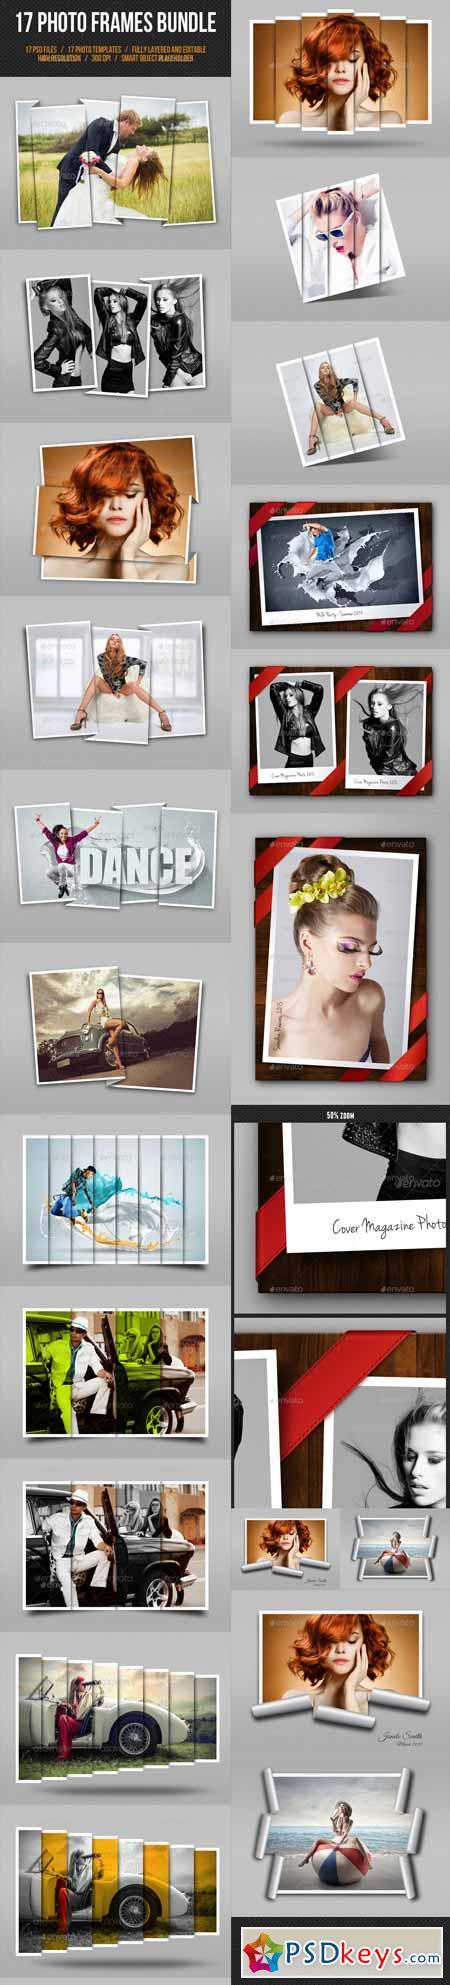 17 Photo Frames Bundle 06 11766272